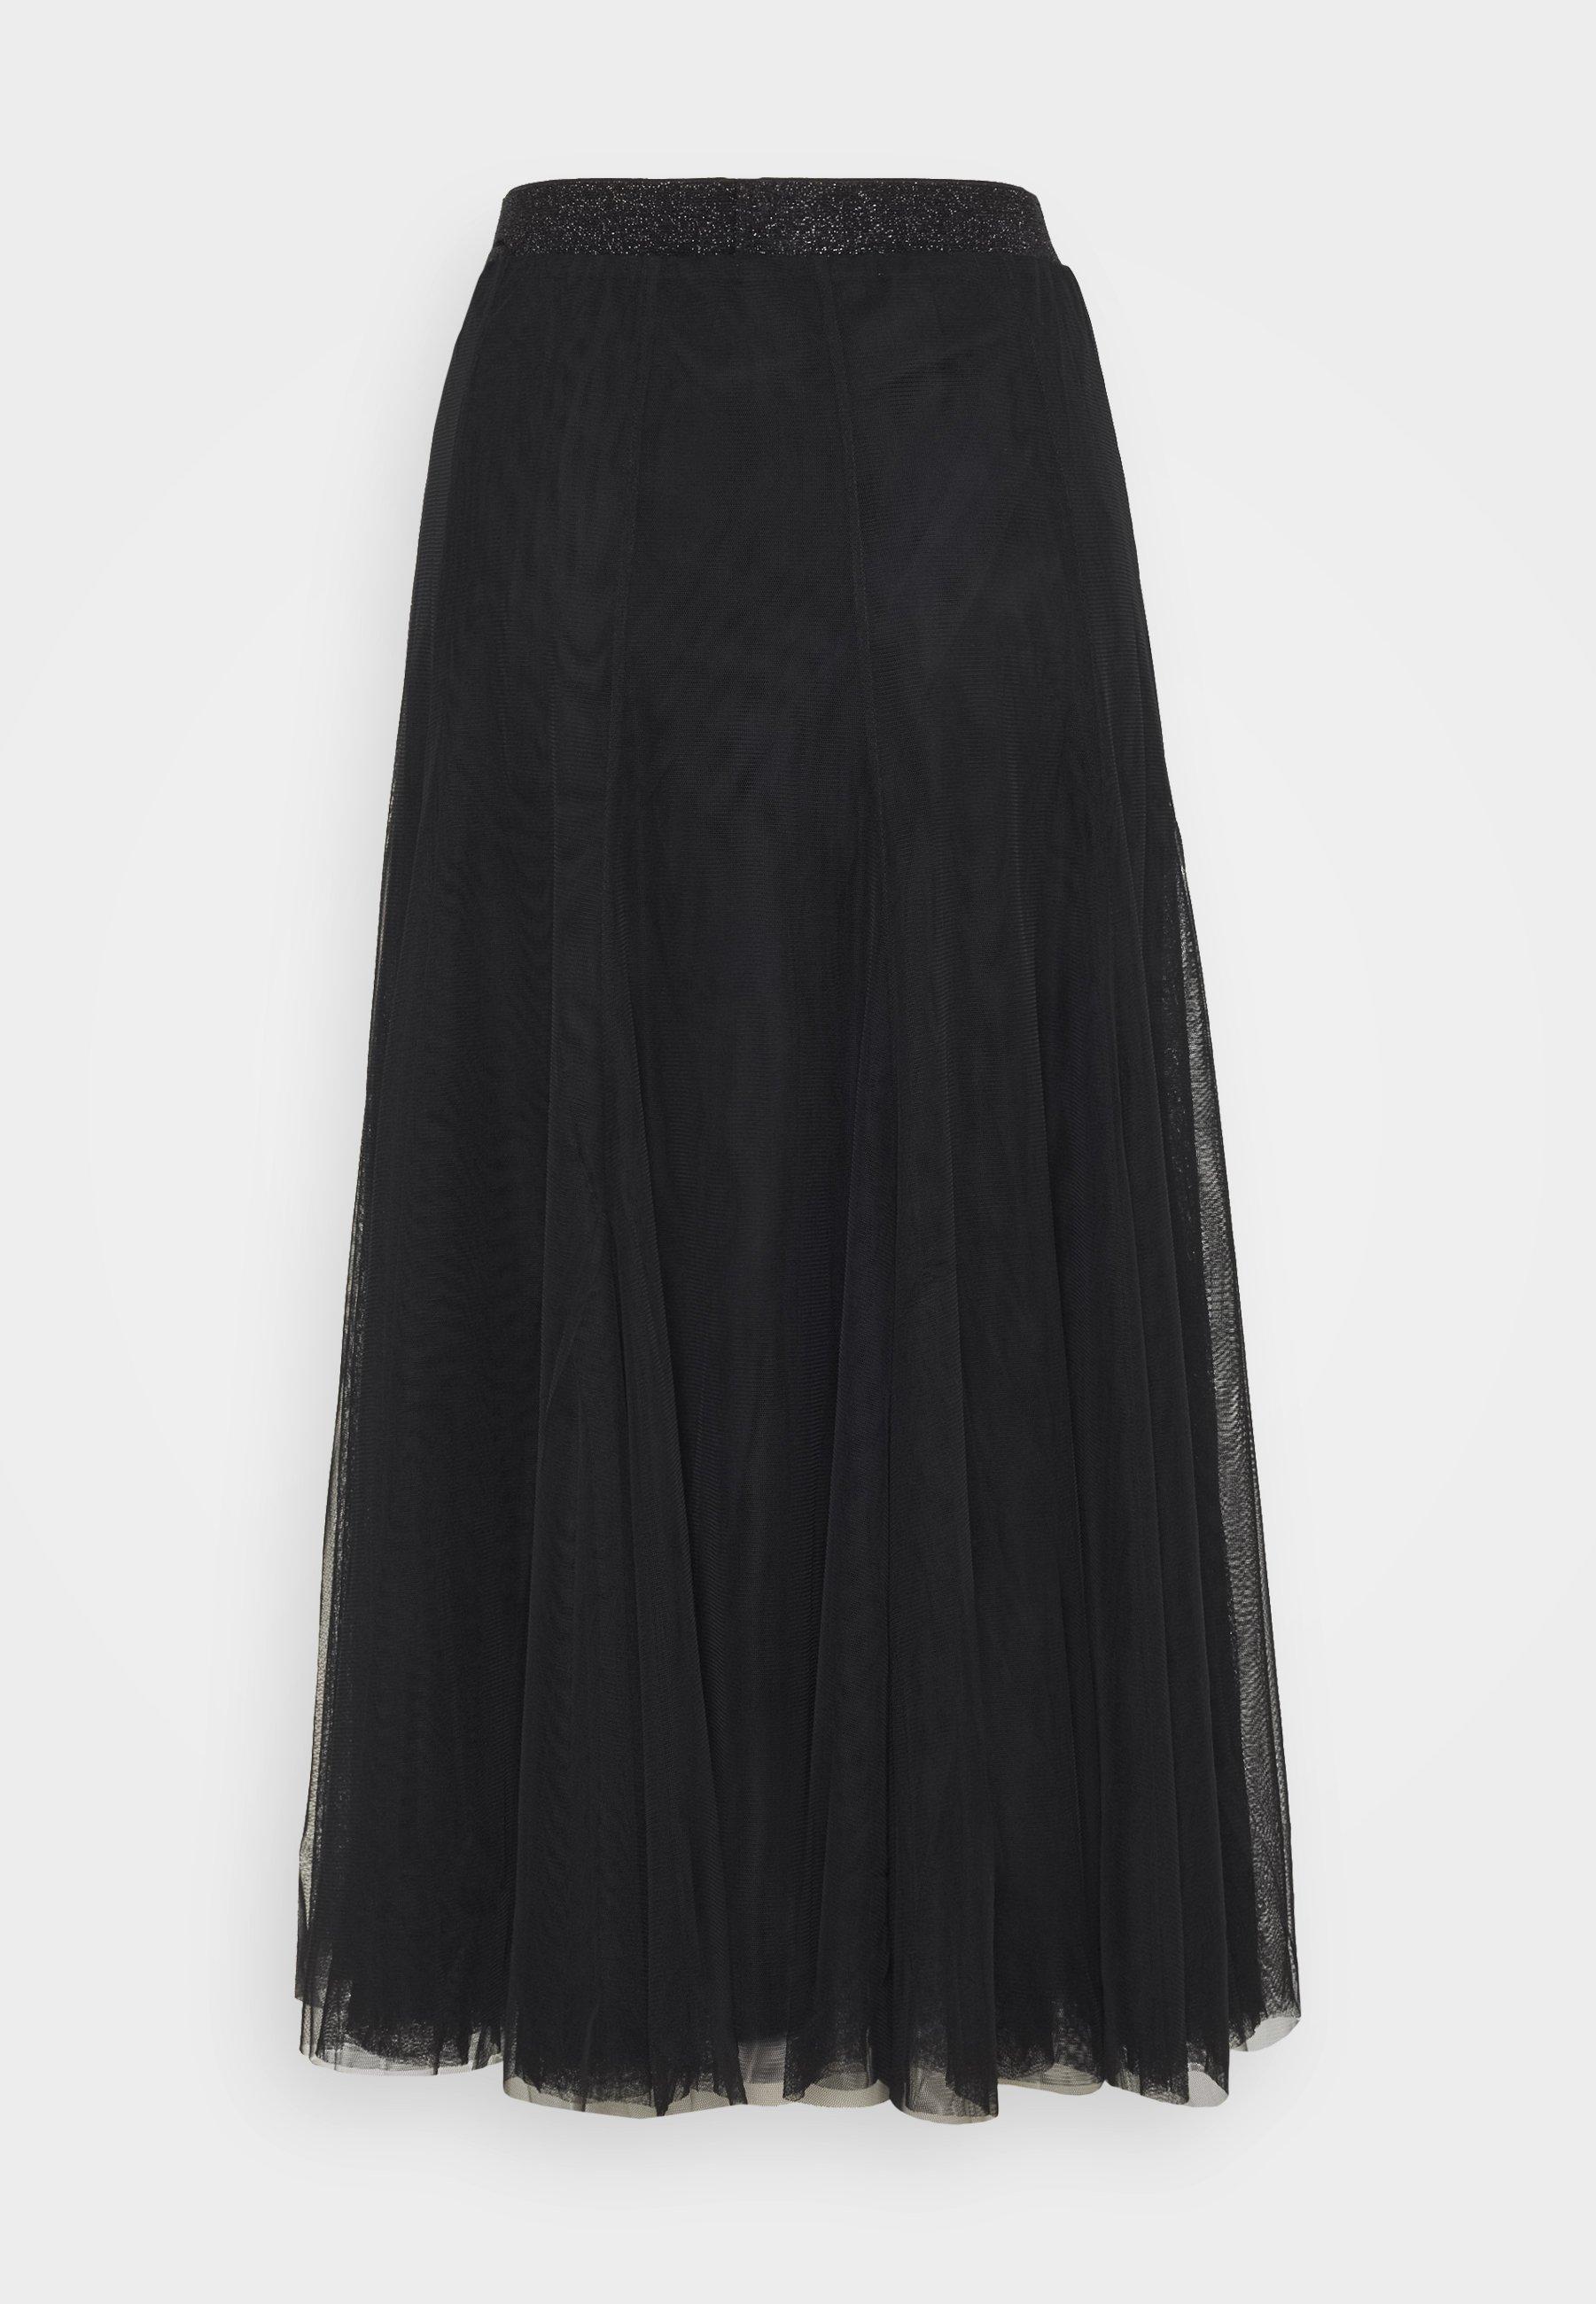 Femme LALA ABBIE SKIRT - Jupe plissée